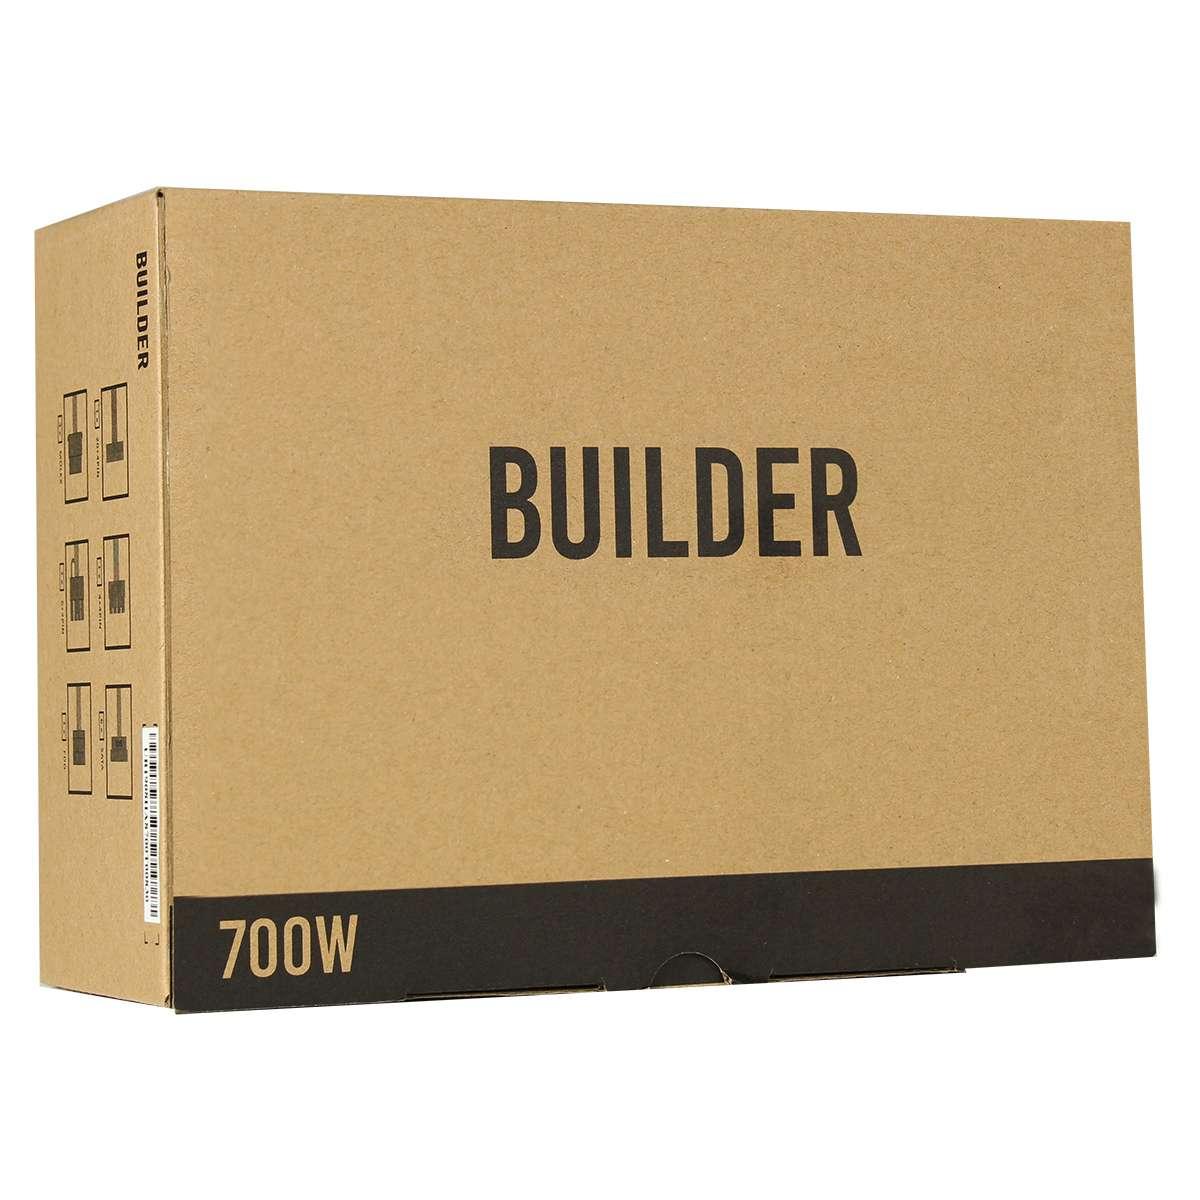 700W Builder PSU PPFC 6xSata 1xPCIE6+2 4+4pin